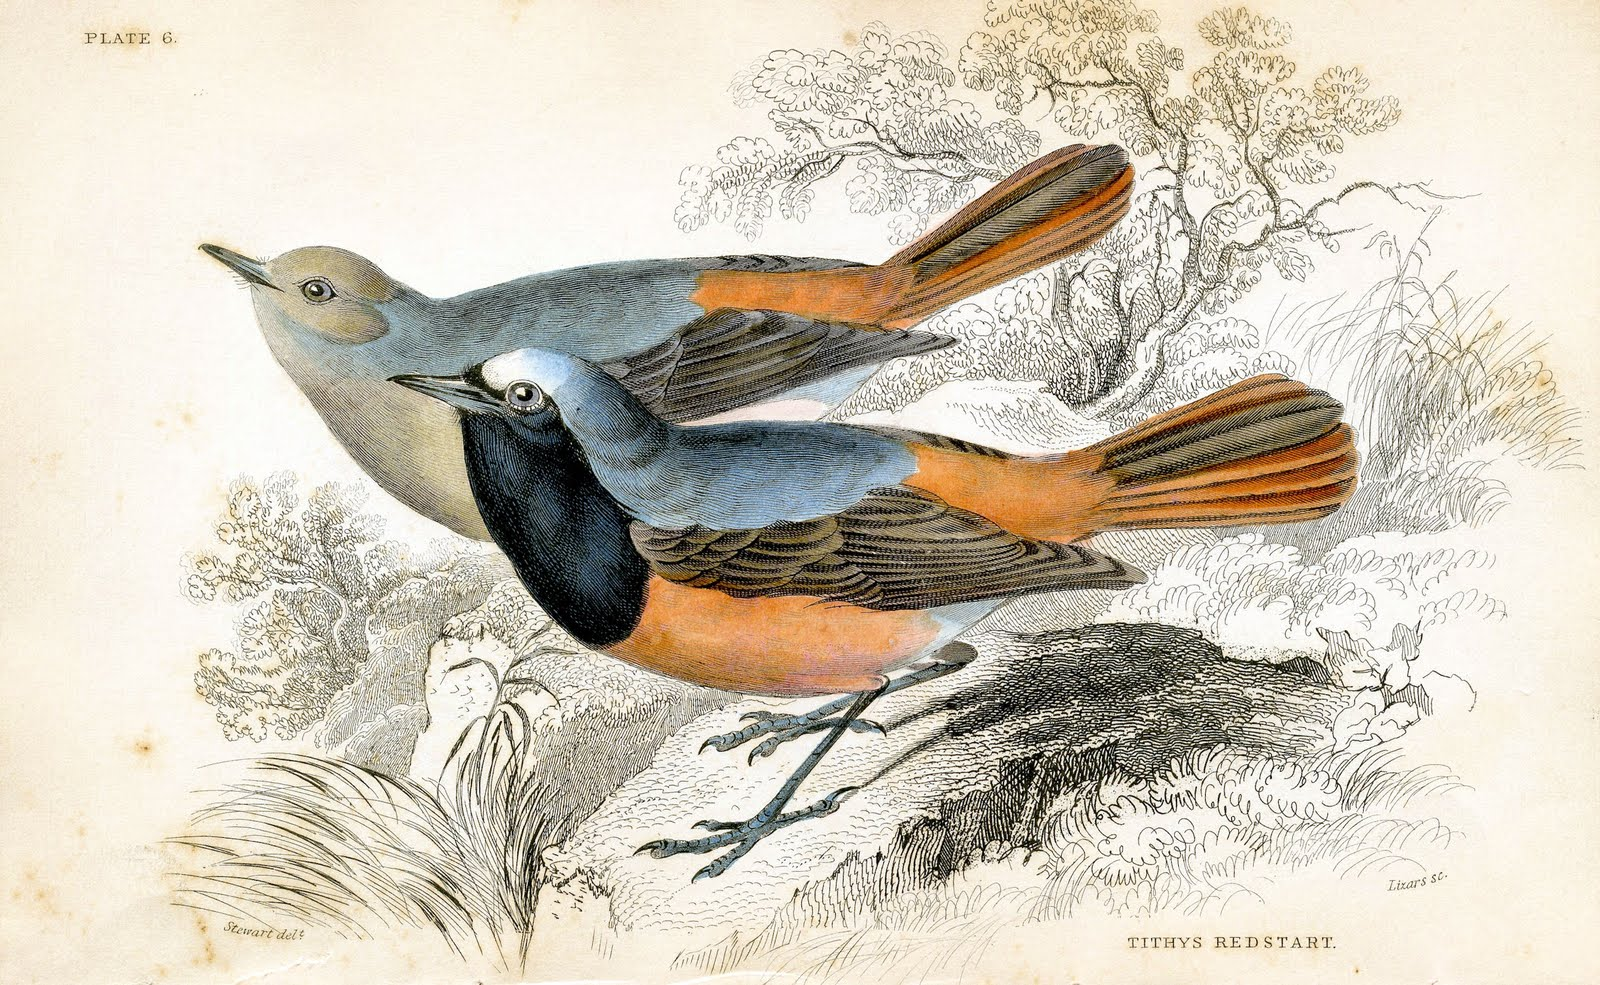 a4b9f3f89dc Antique Clip Art - 1830s Bird Print - The Graphics Fairy